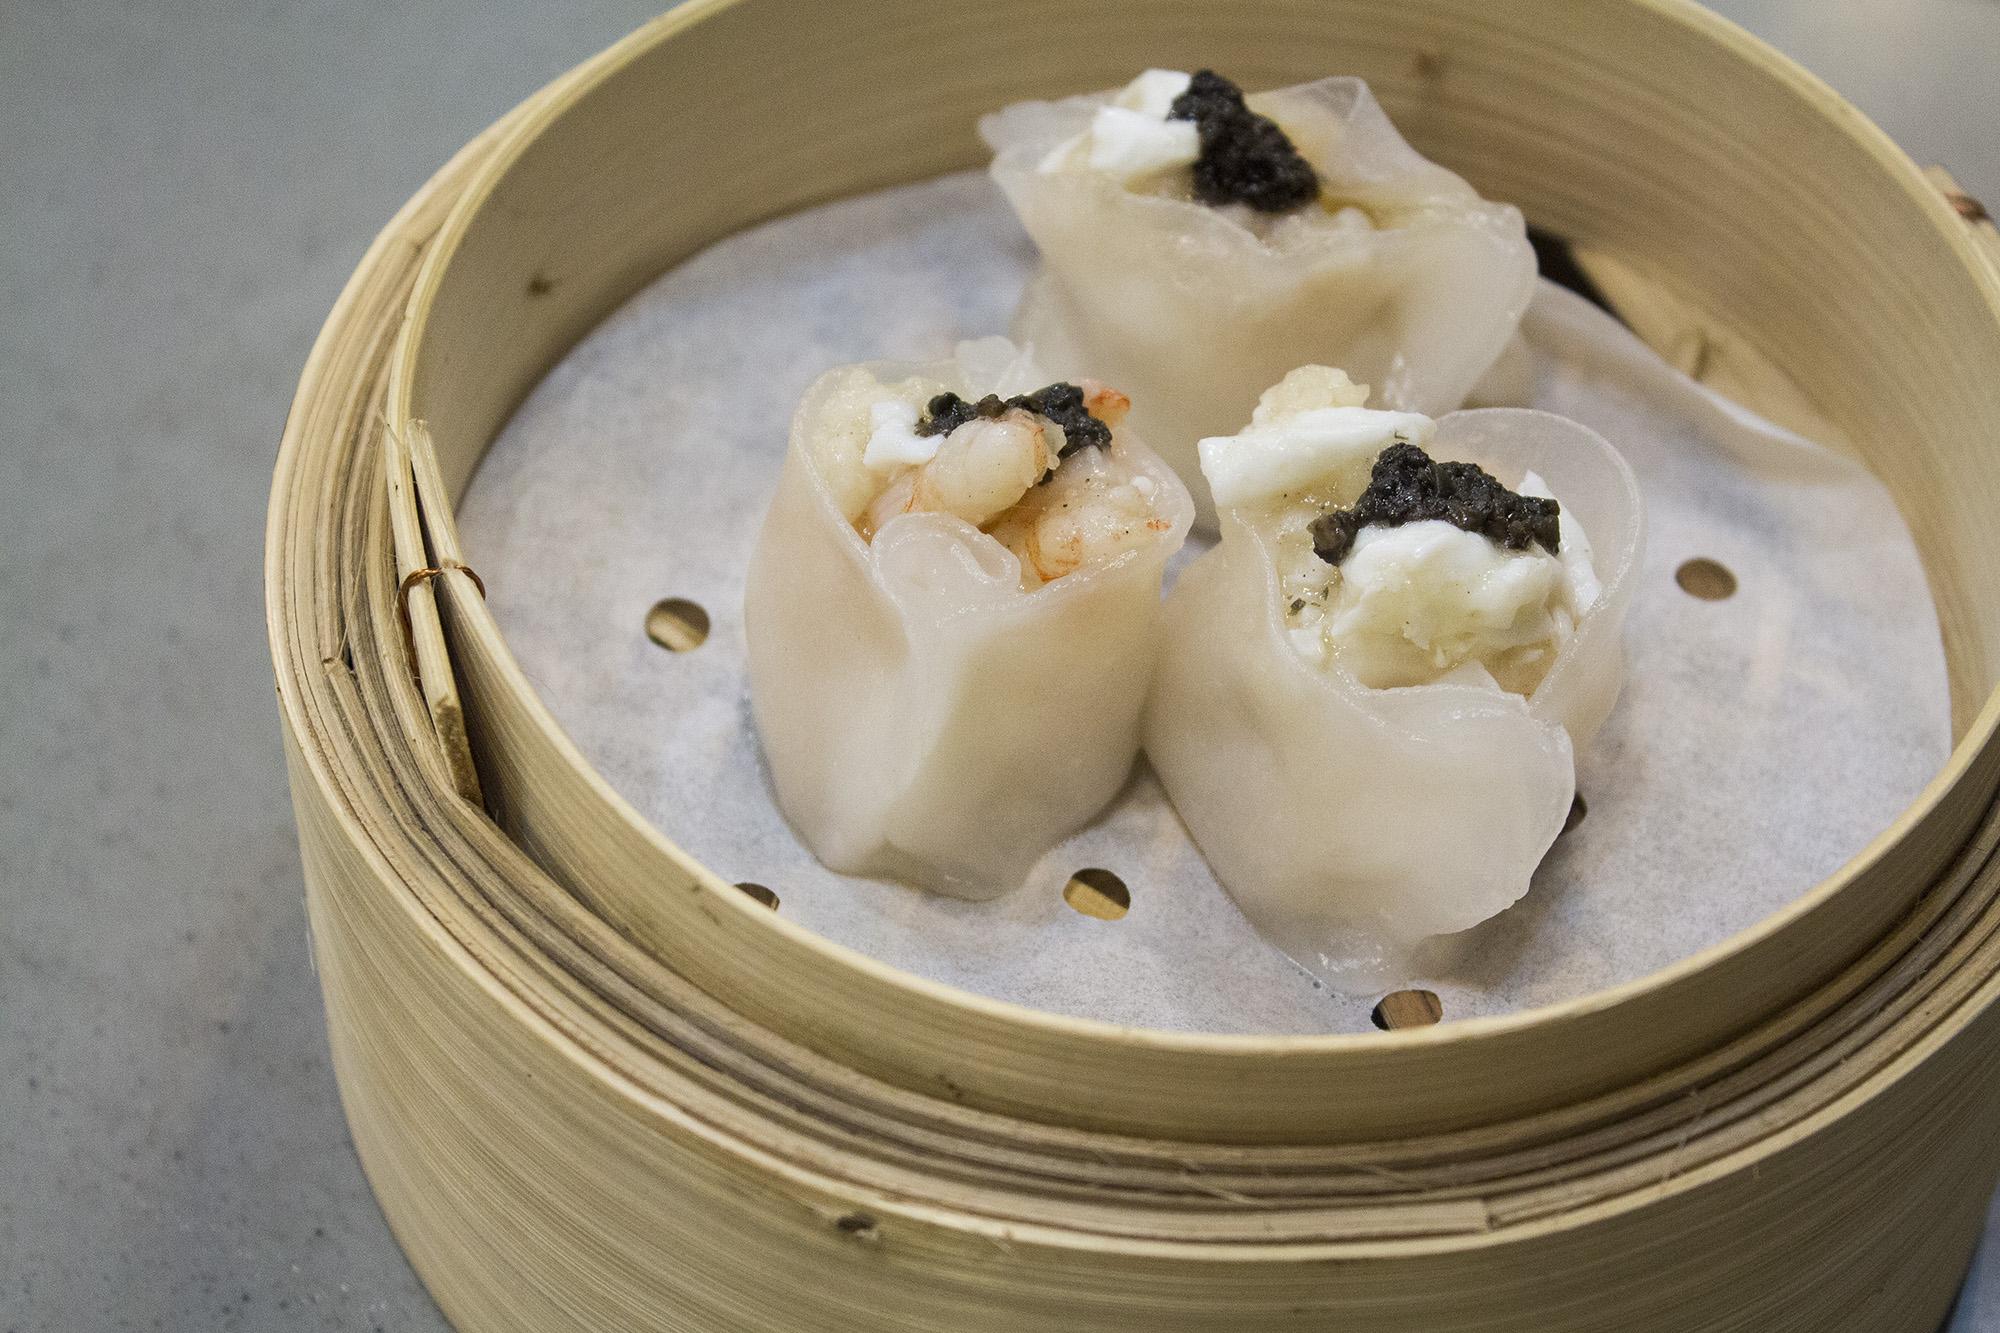 Perigord truffle and scrambled egg white dumplings